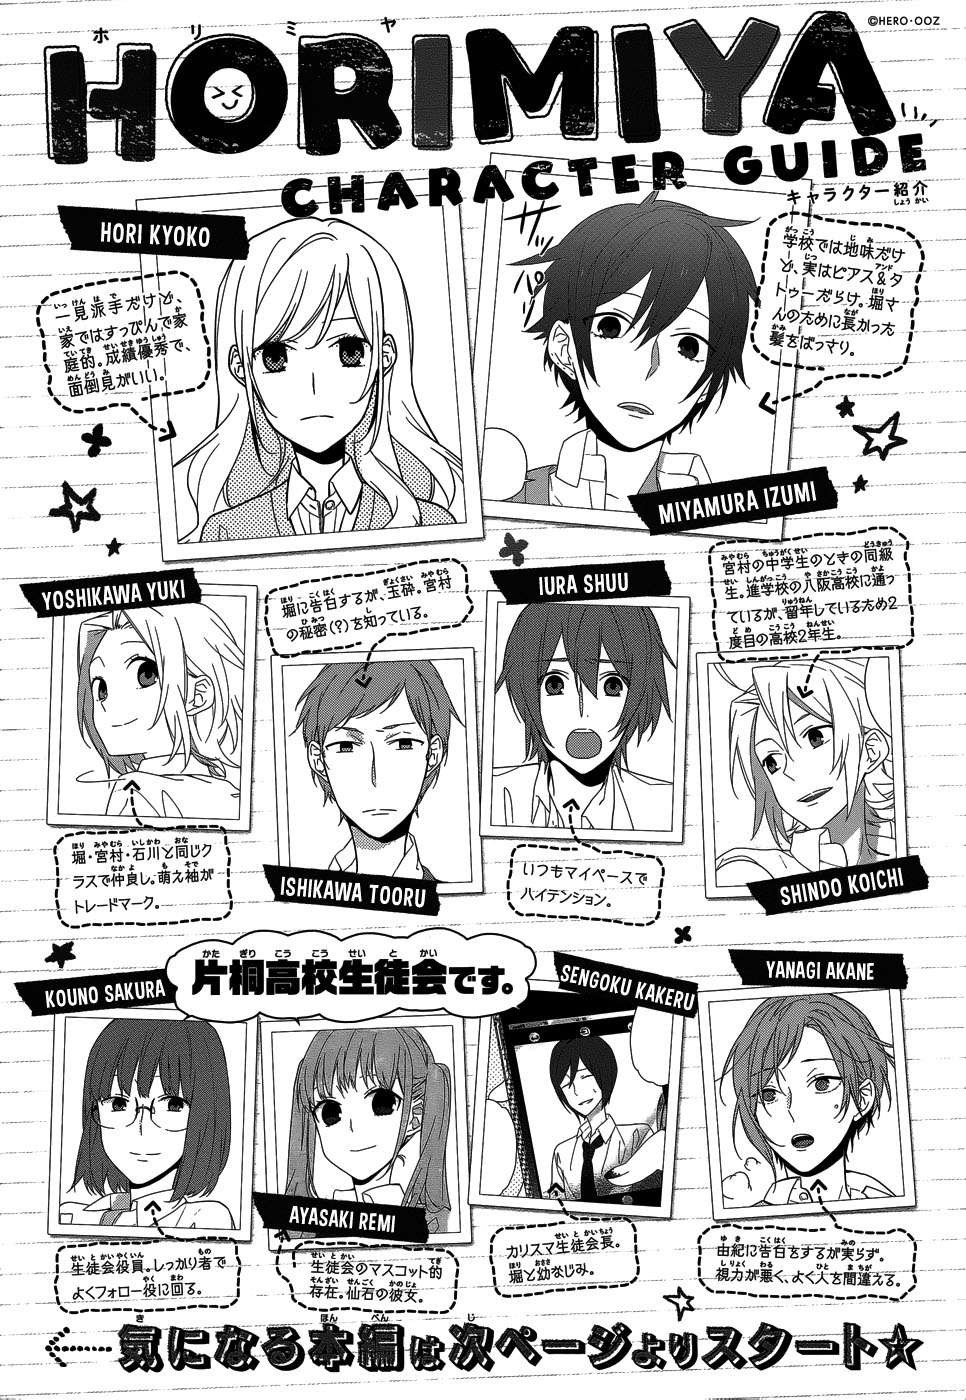 http://c5.ninemanga.com/es_manga/19/1043/364679/77596ce7097c5f353cffcc865487d9e2.jpg Page 2